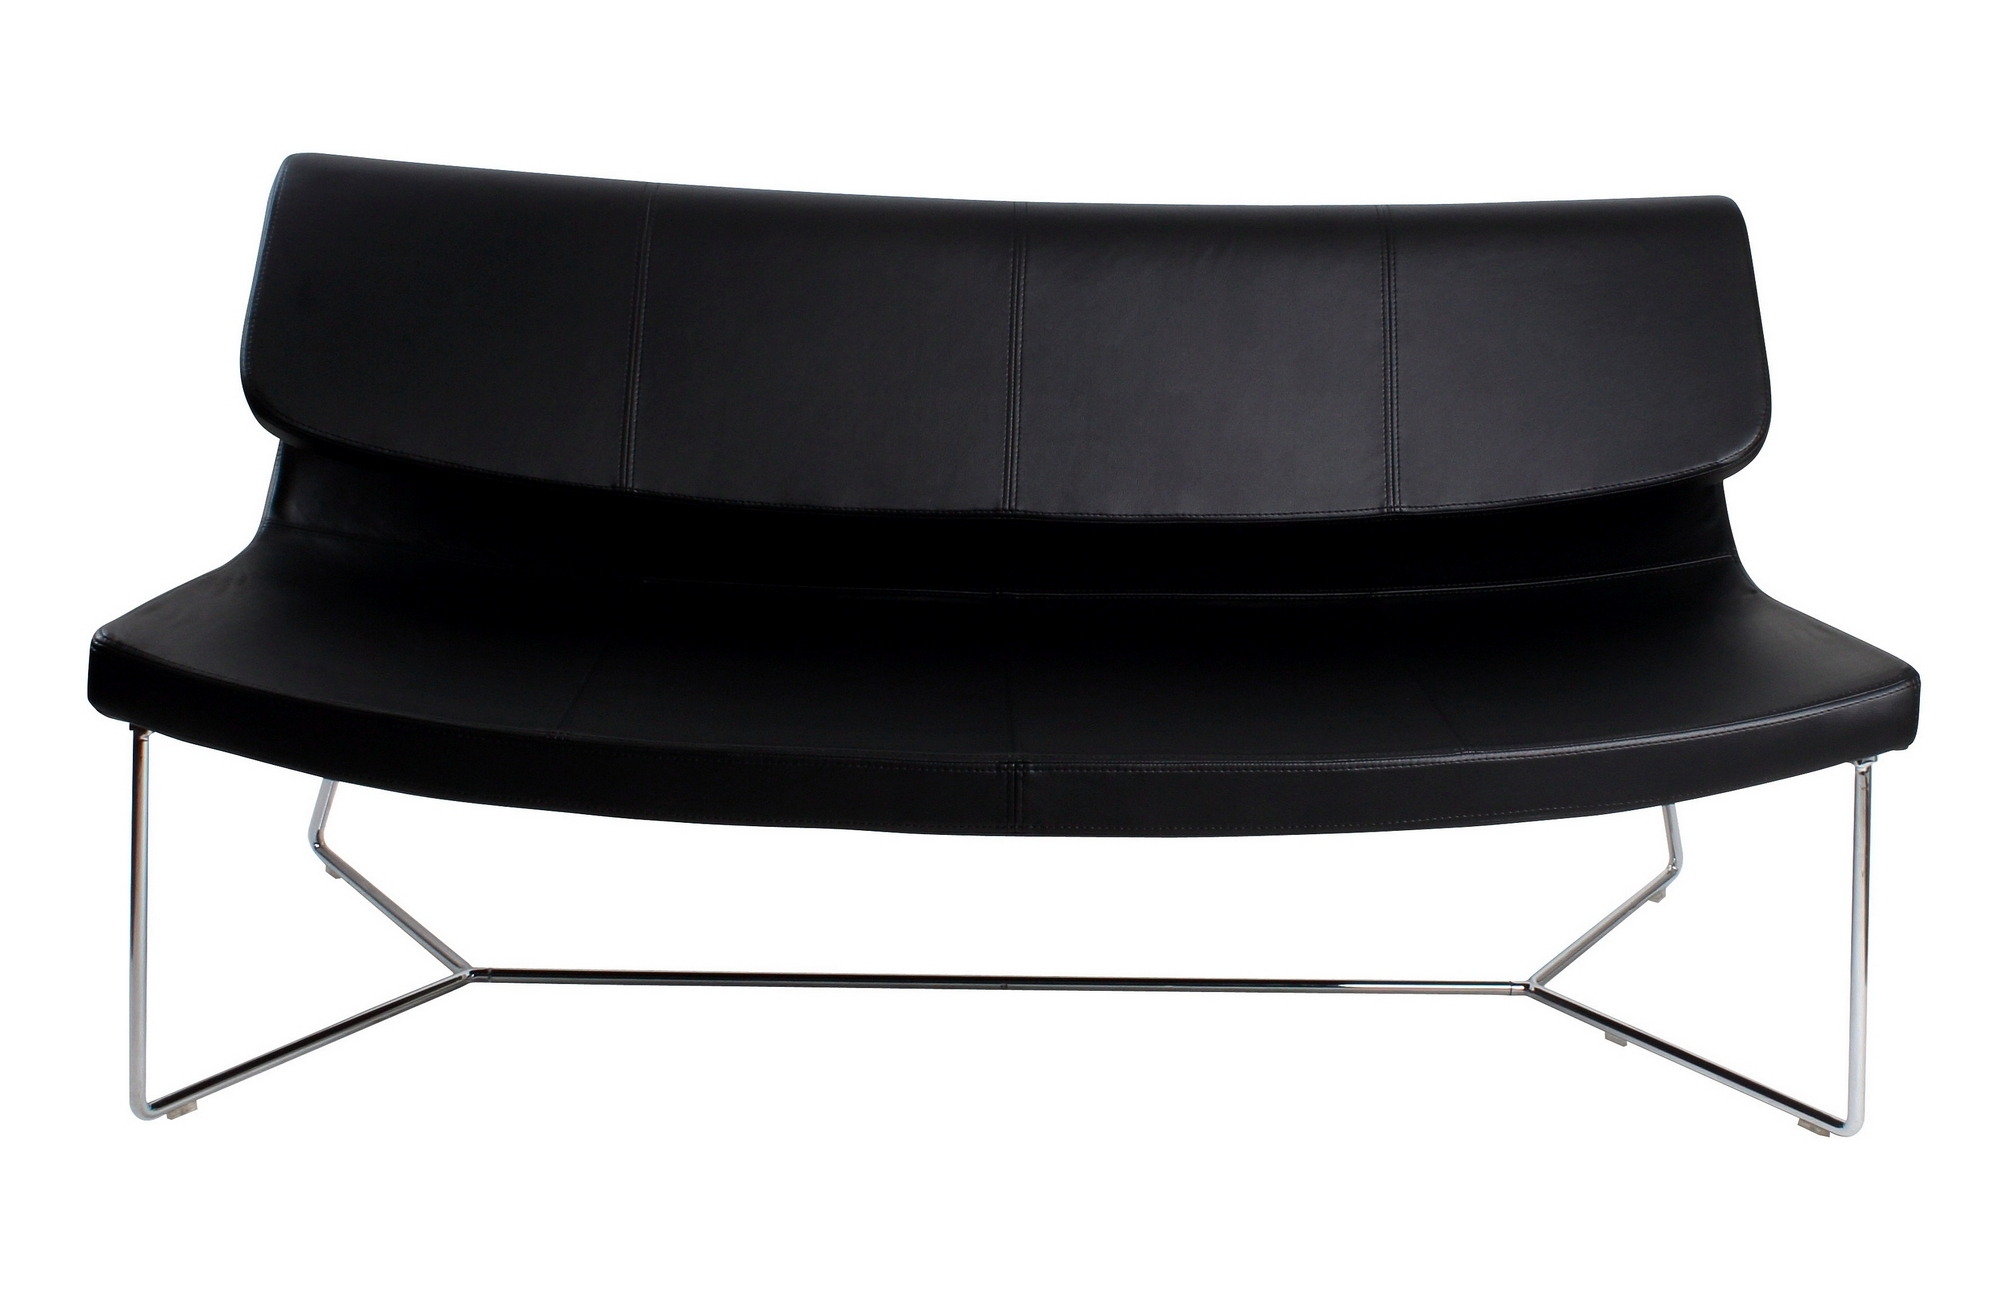 Brennan Sofa Black Leatherette Regarding Brennan Sofa Chairs (Image 8 of 25)